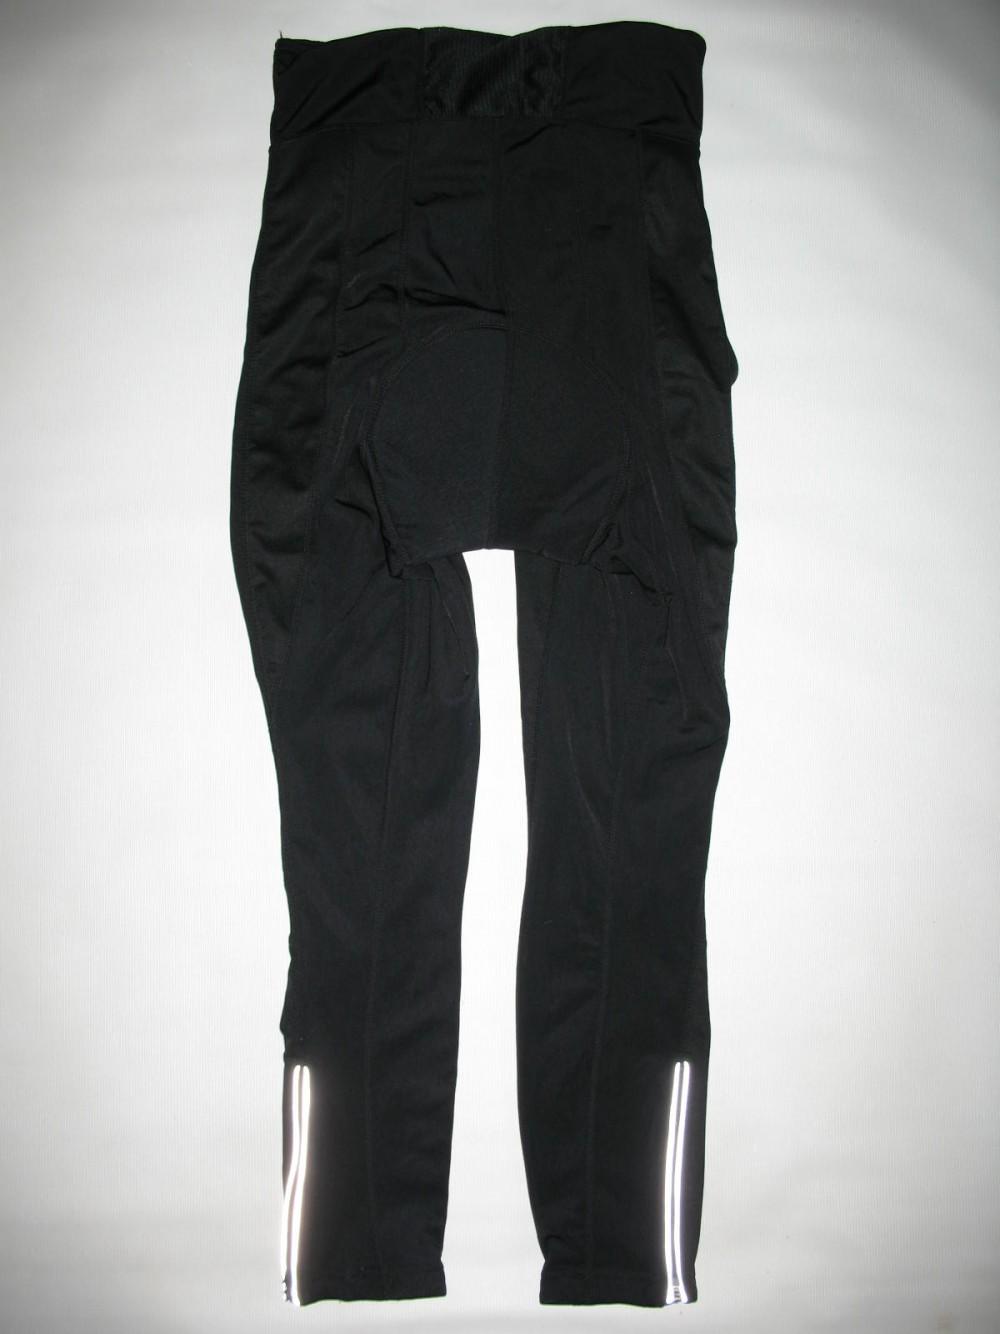 Велобрюки CRANE windstopper bib cycling pants (размер unisex S) - 1